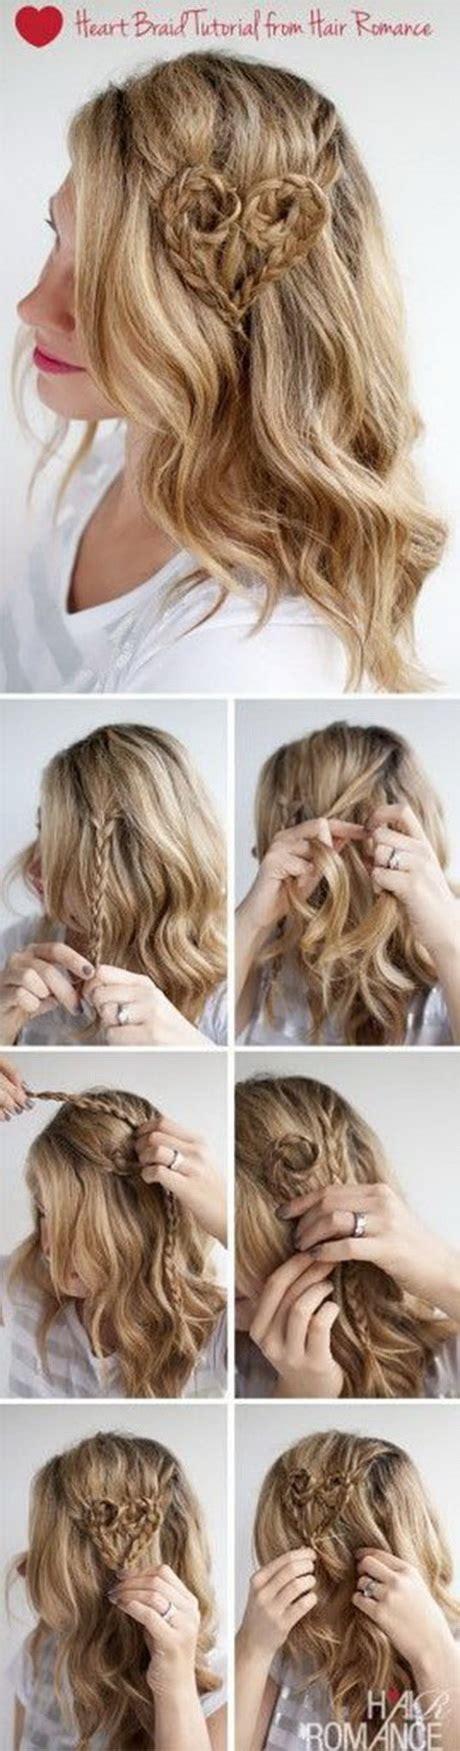 picture day hairstyles hairstyles picture day